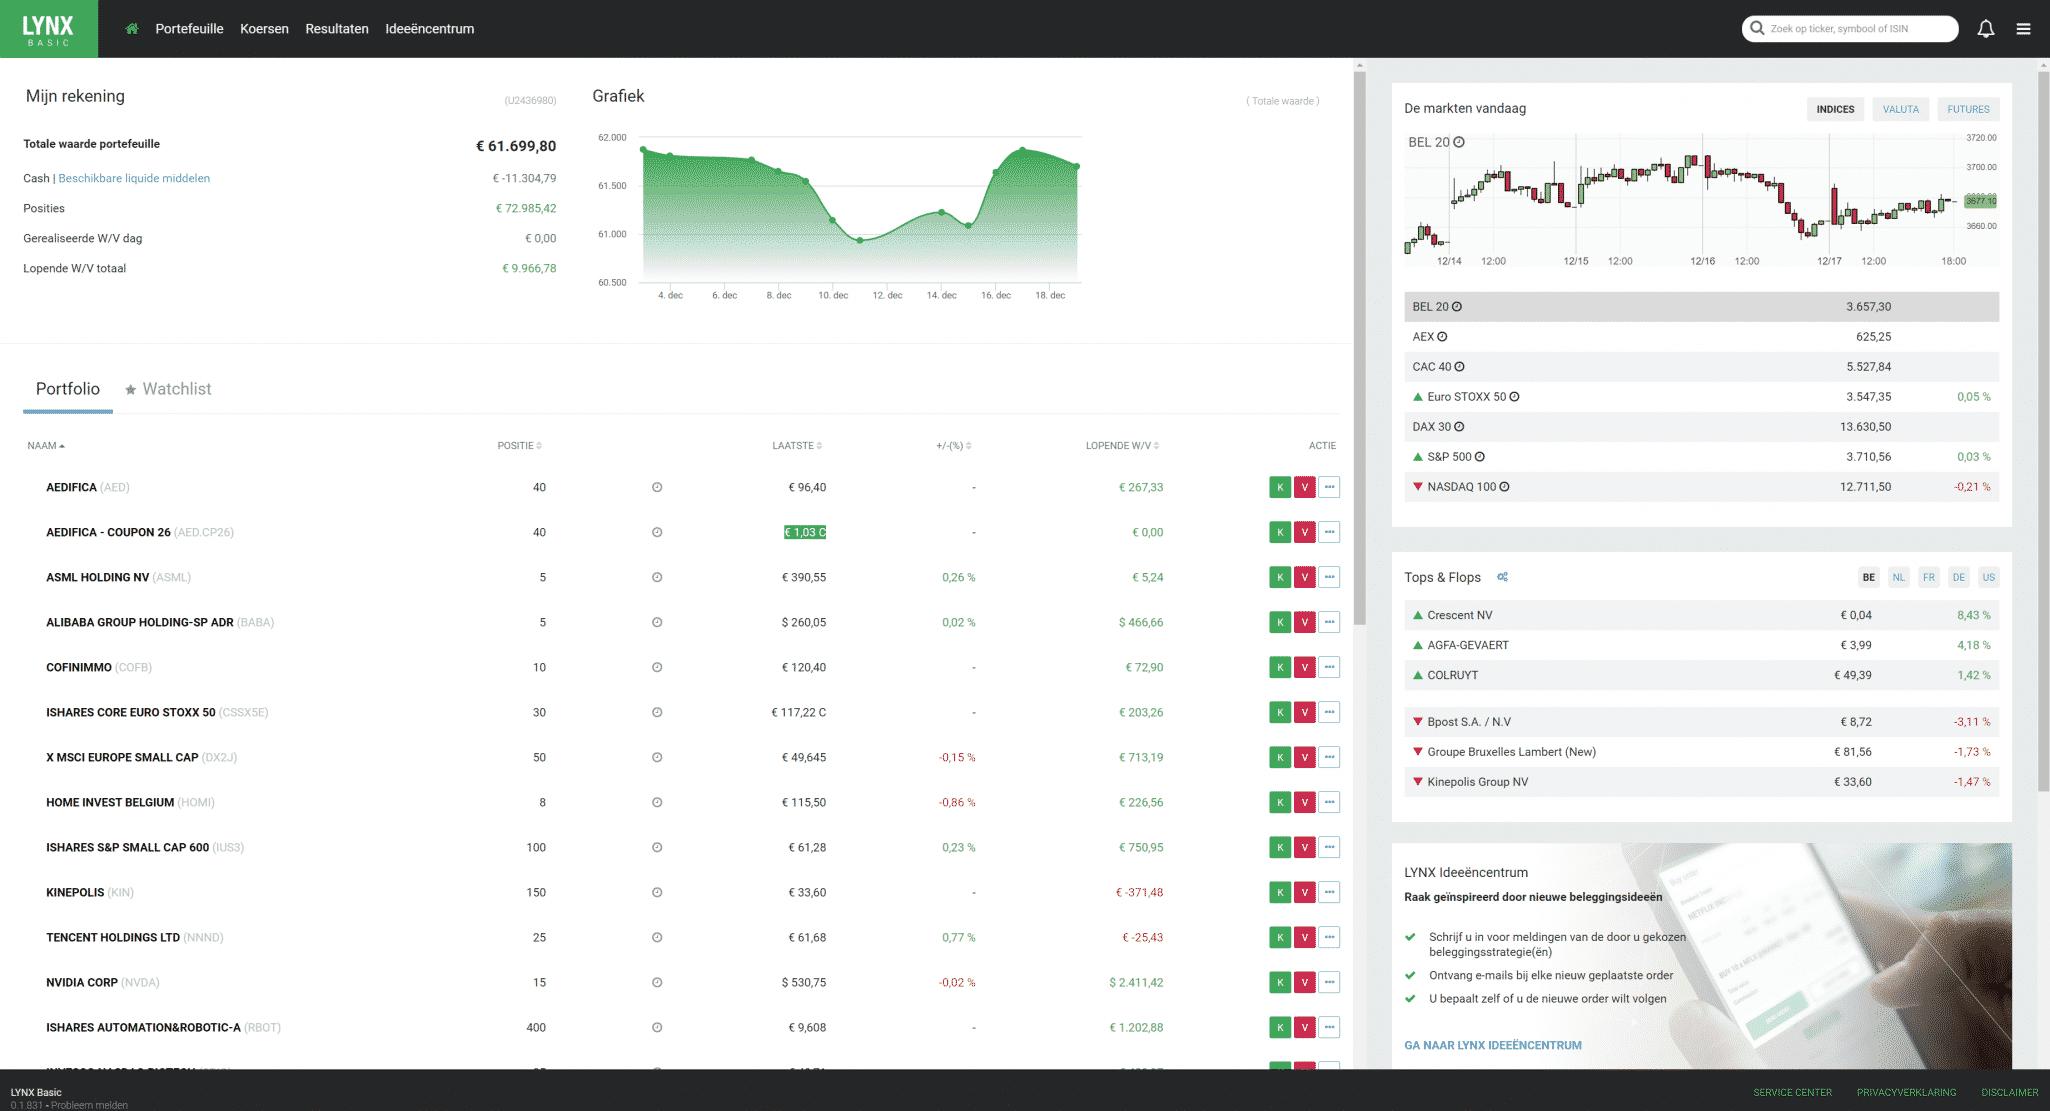 Home screen of Lynx basic